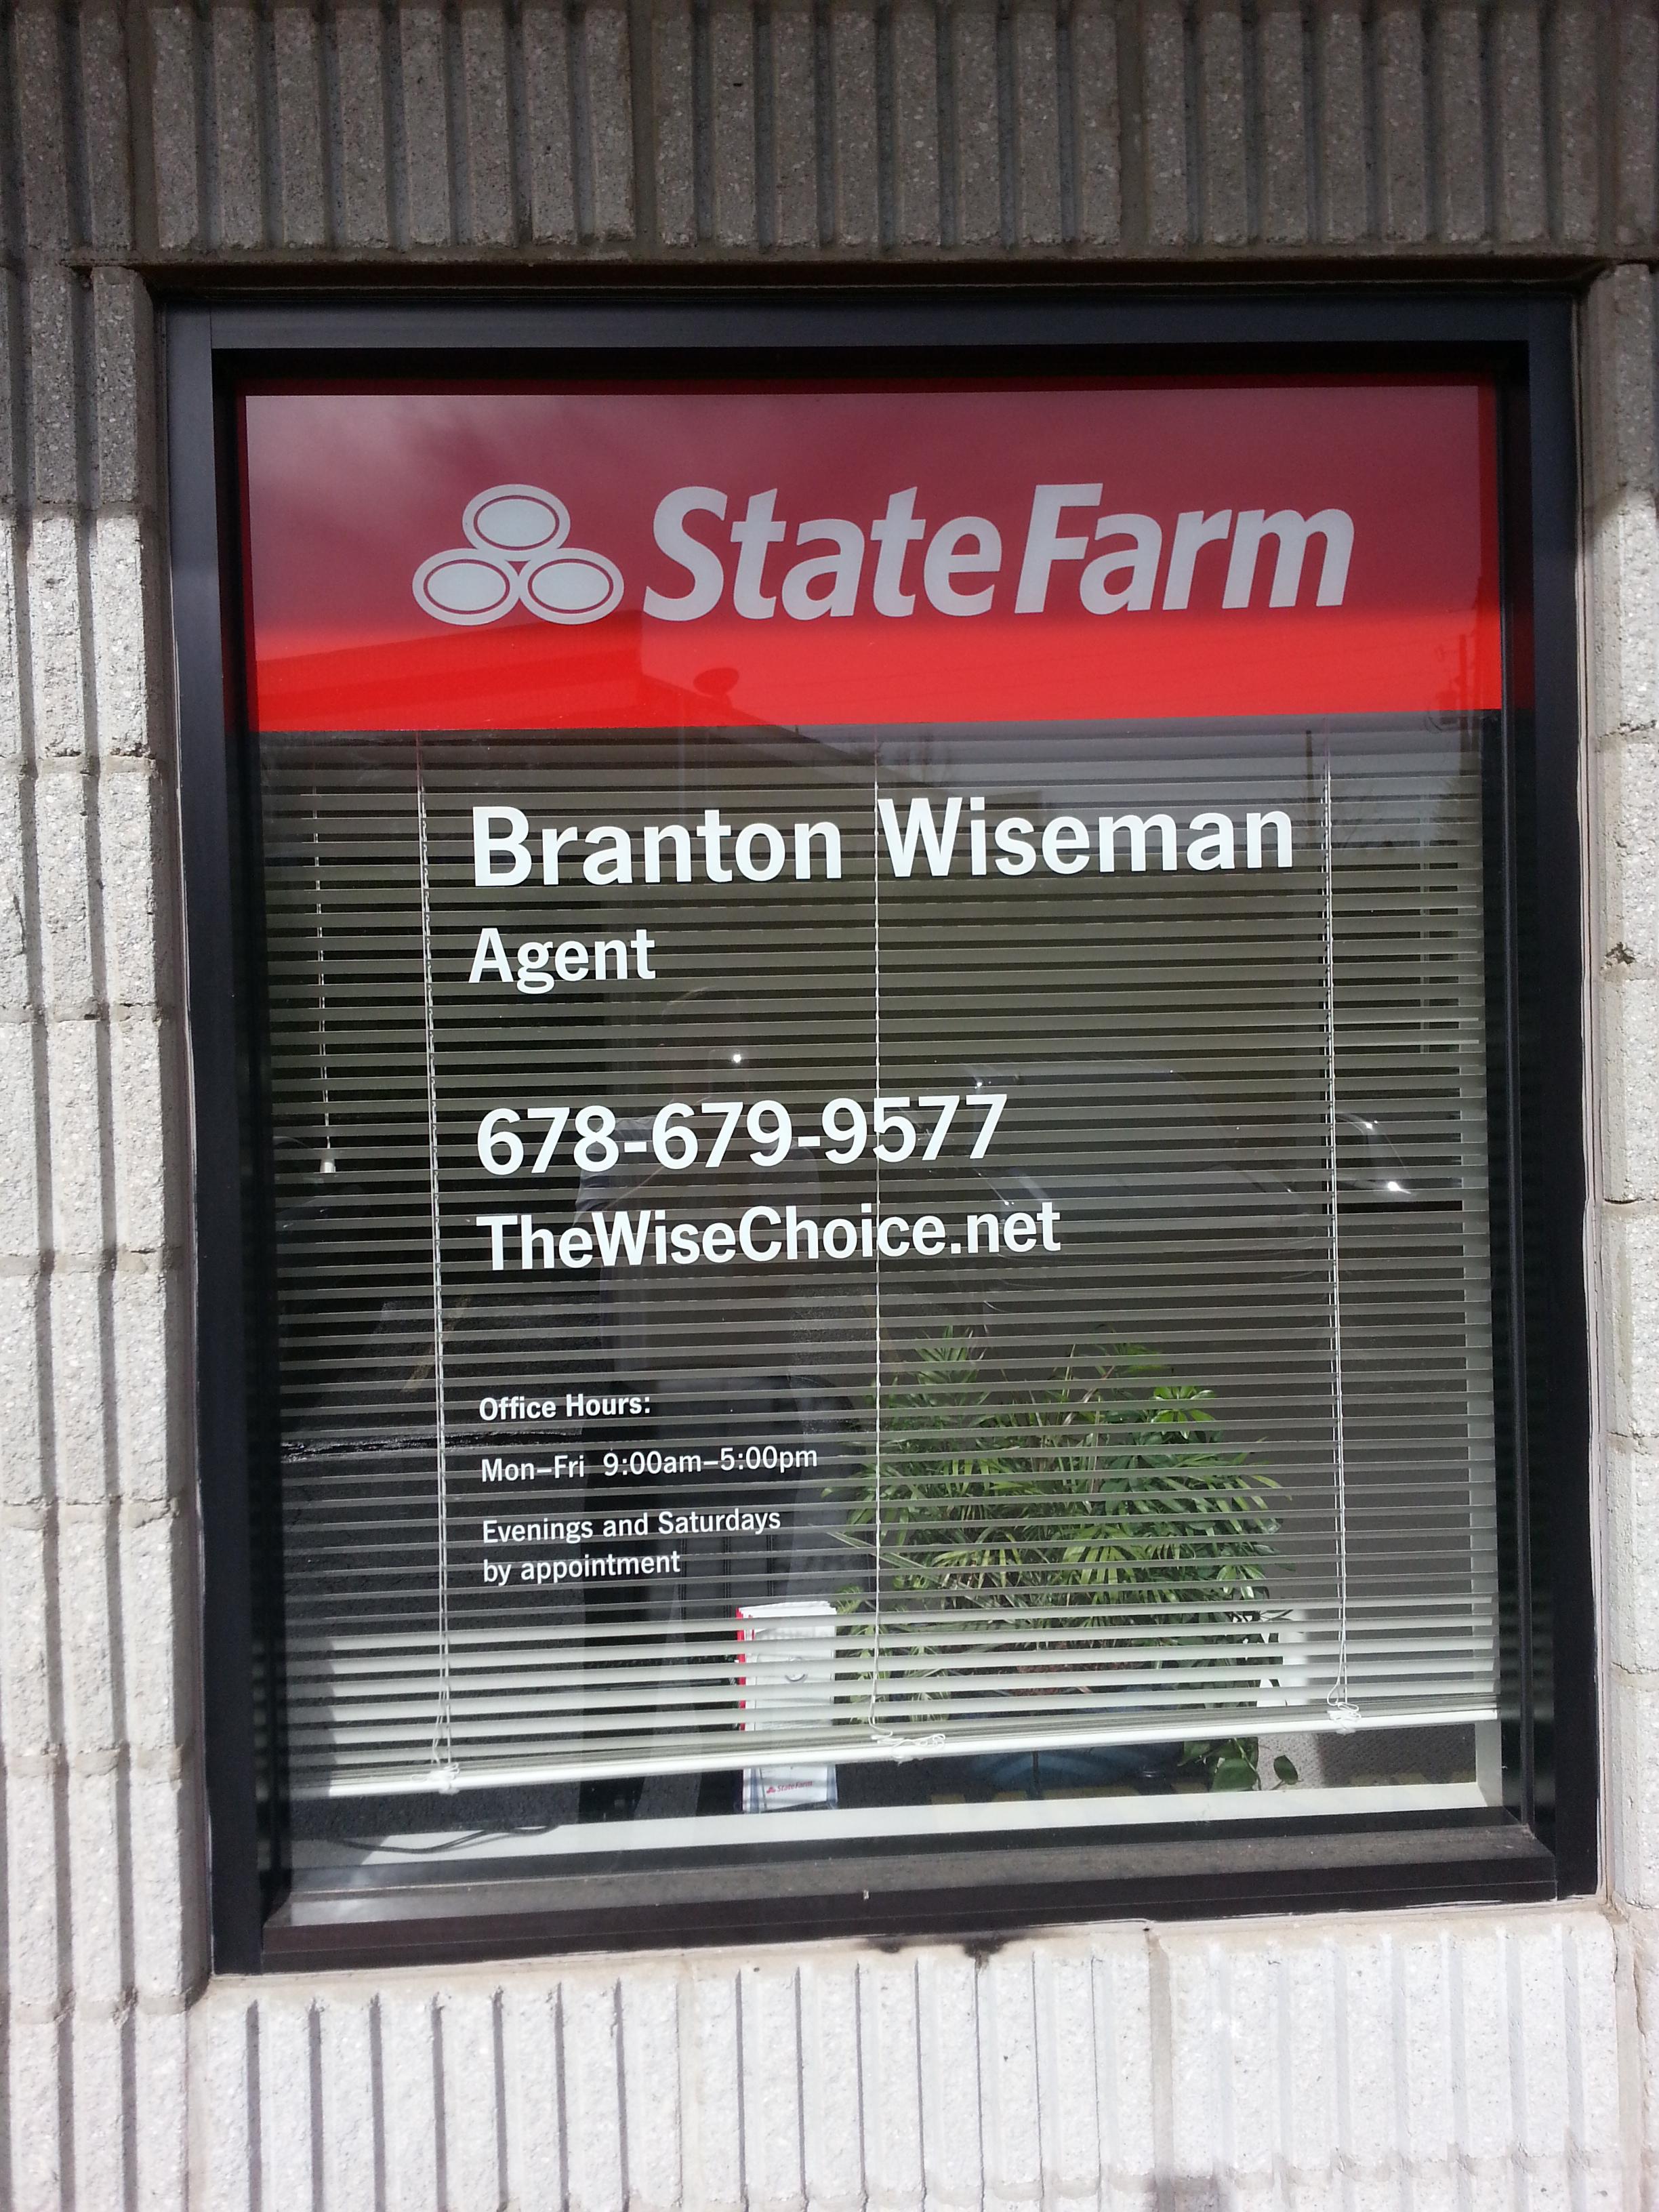 Branton Wiseman - State Farm Insurance Agent image 1